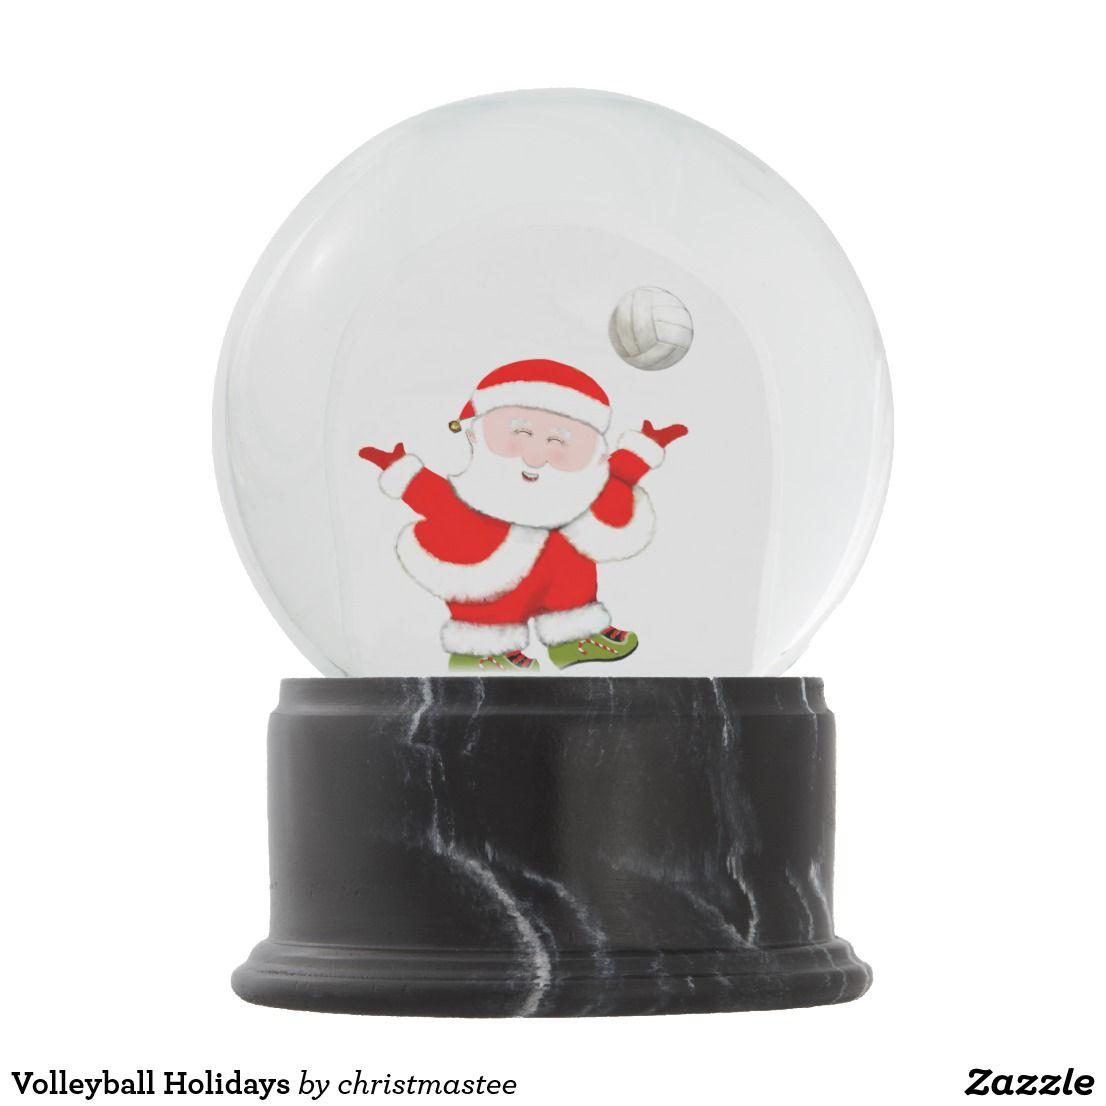 Volleyball Holidays Snow Globe Zazzle Com Holiday Snow Globe Snow Globes Special Christmas Gift